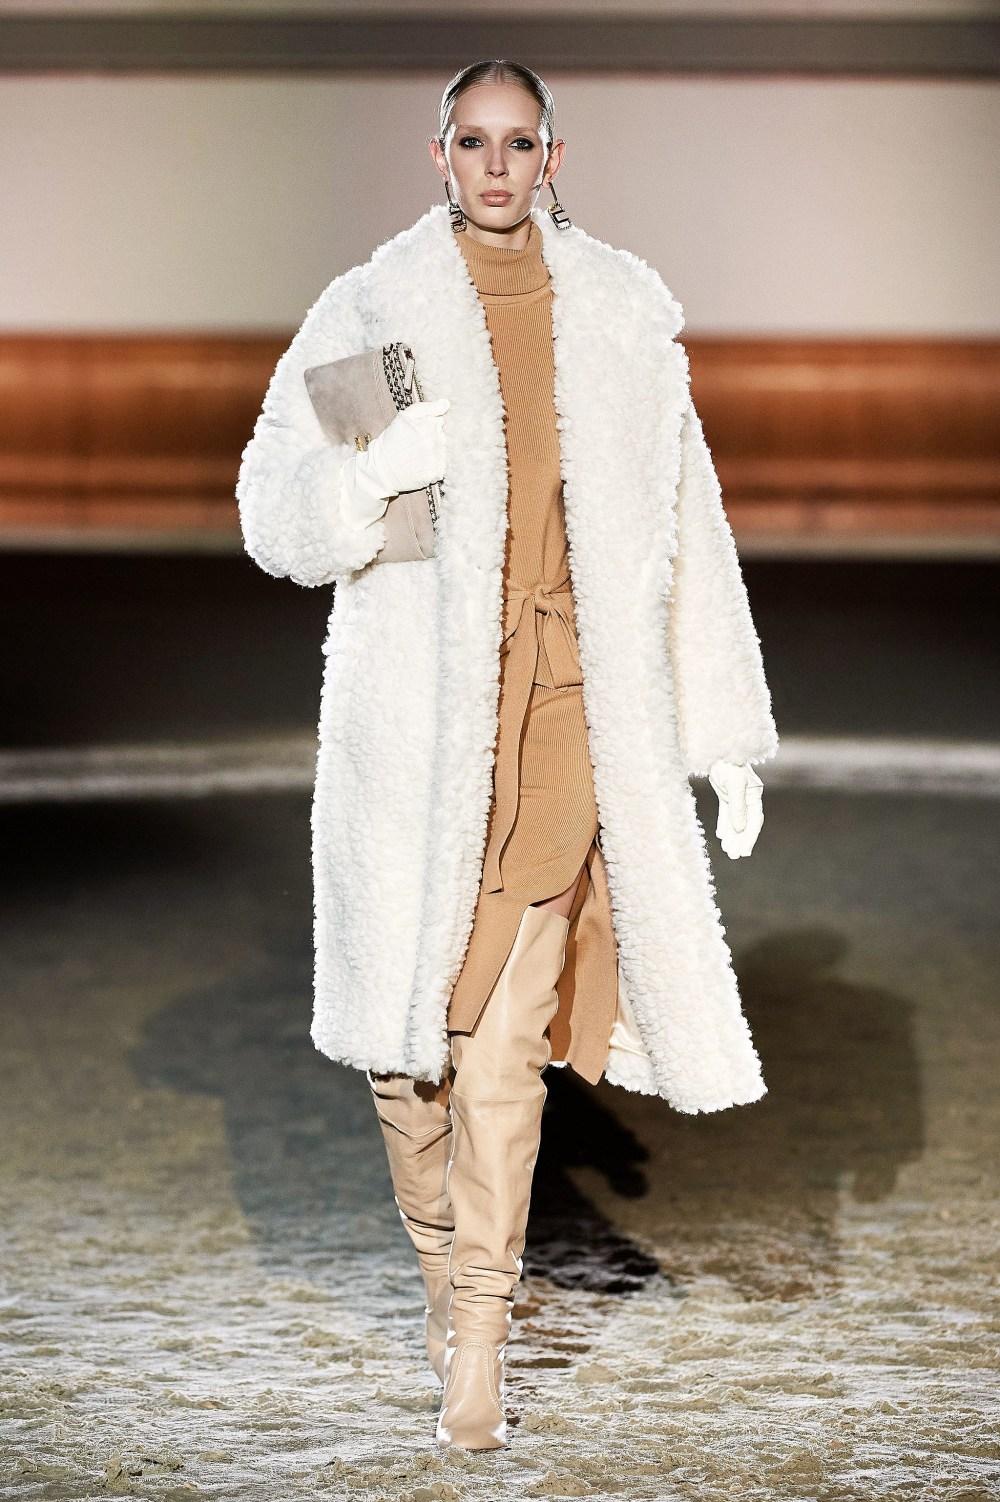 Elisabetta Franchi: Elisabetta Franchi Fall Winter 2021-22 Fashion Show Photo #4